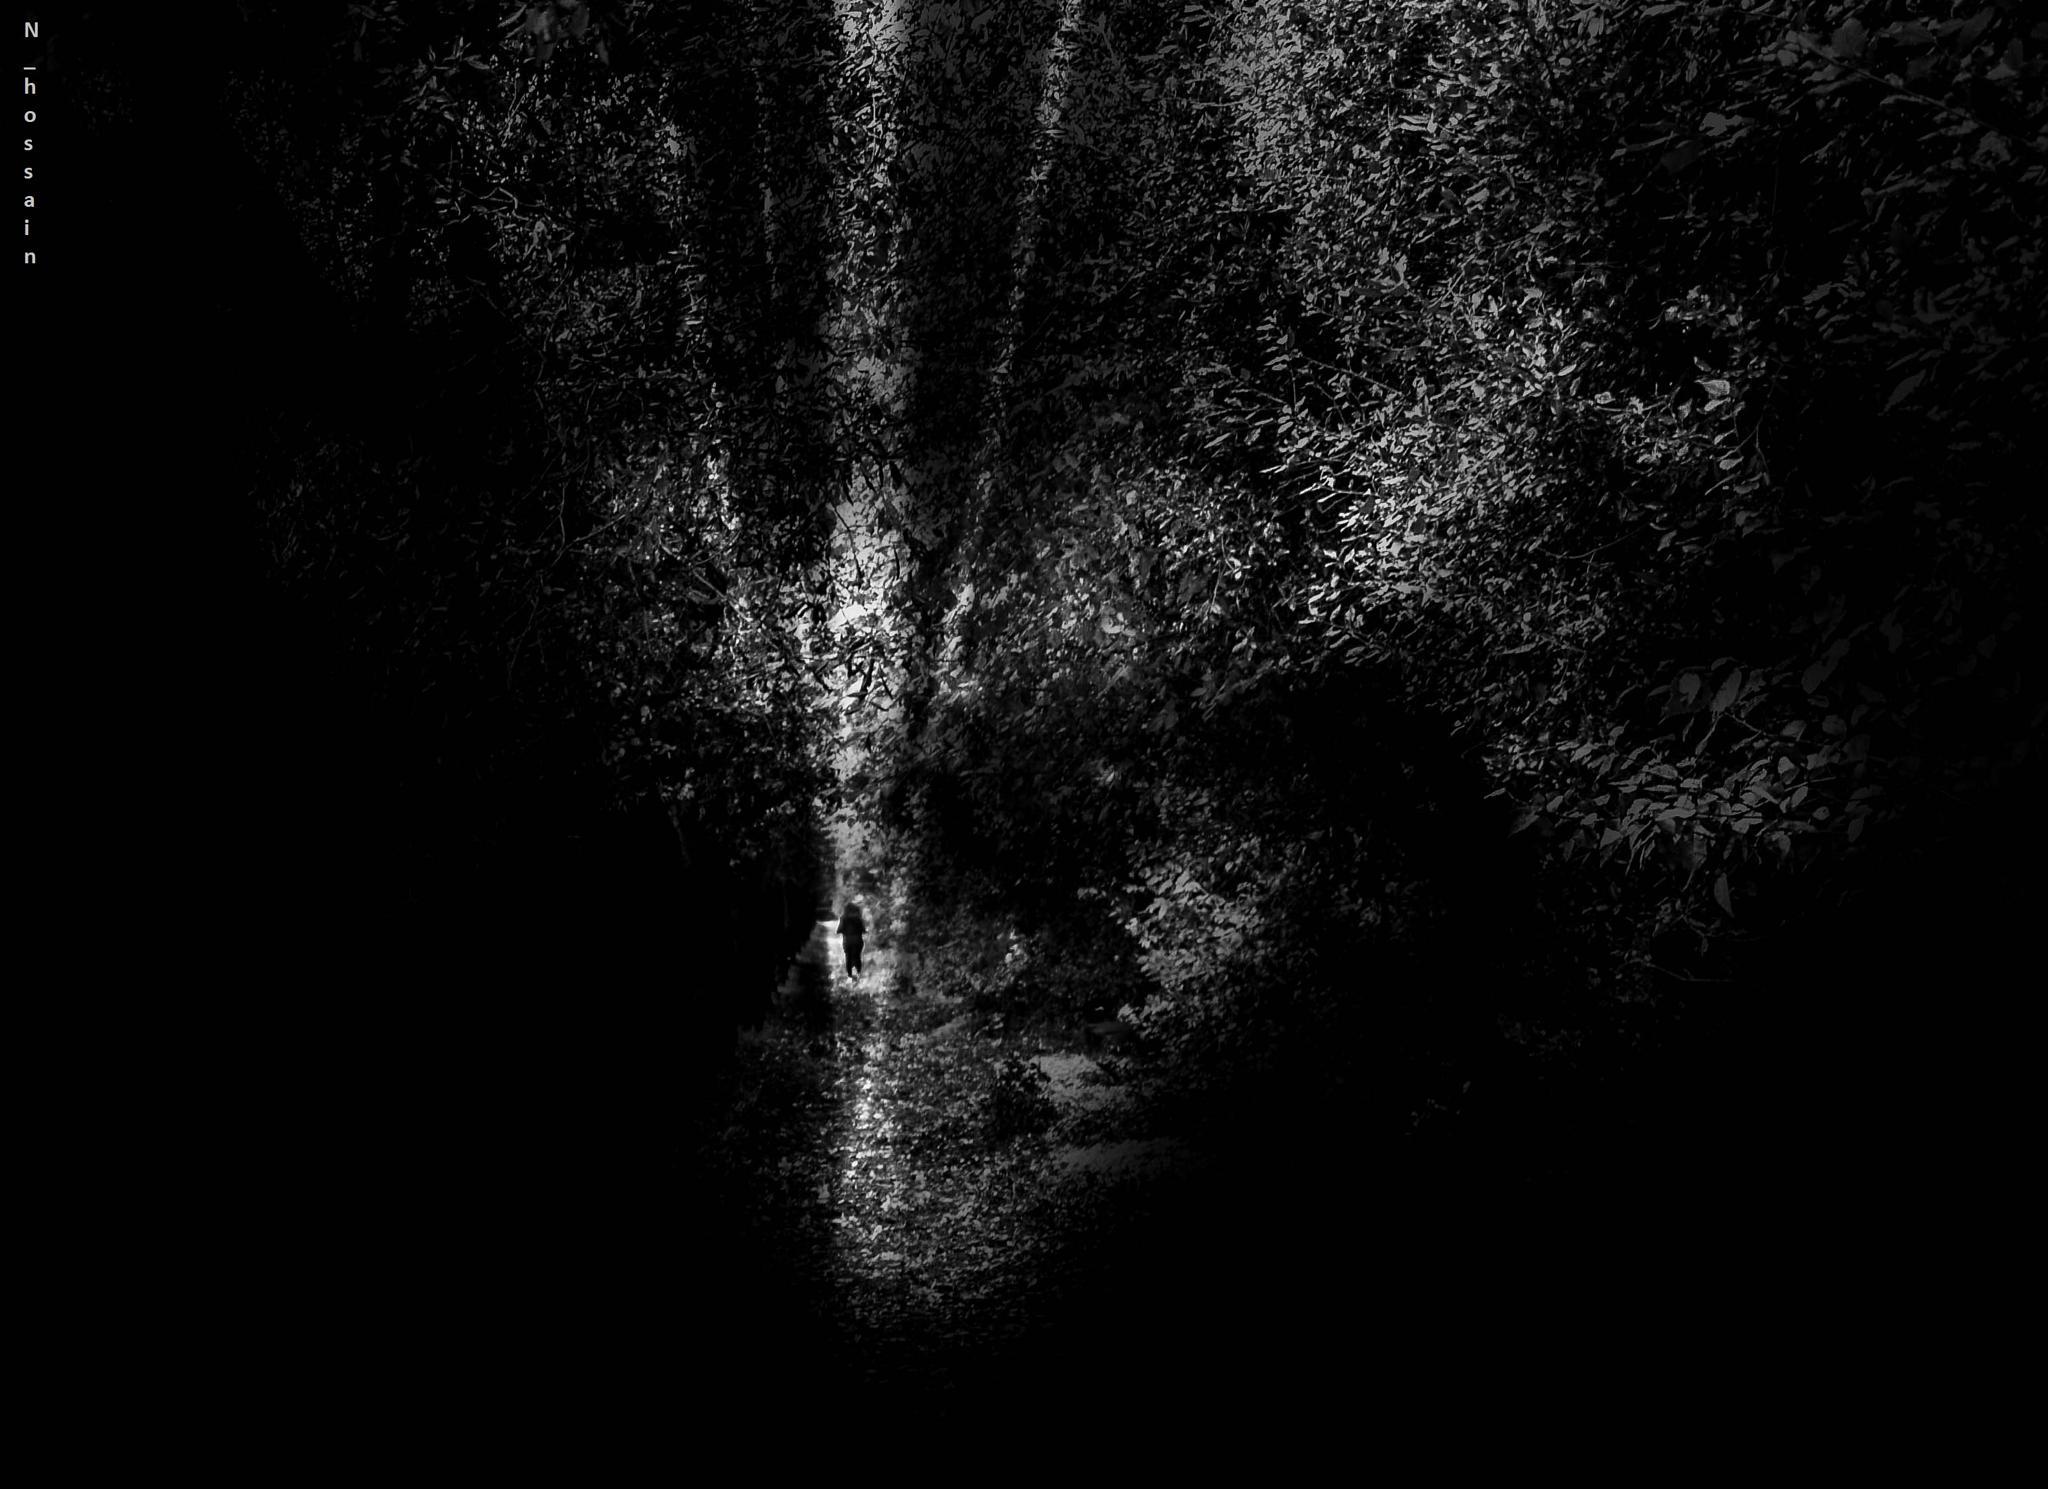 Frenare l'oscurità by Nazmul Hossain